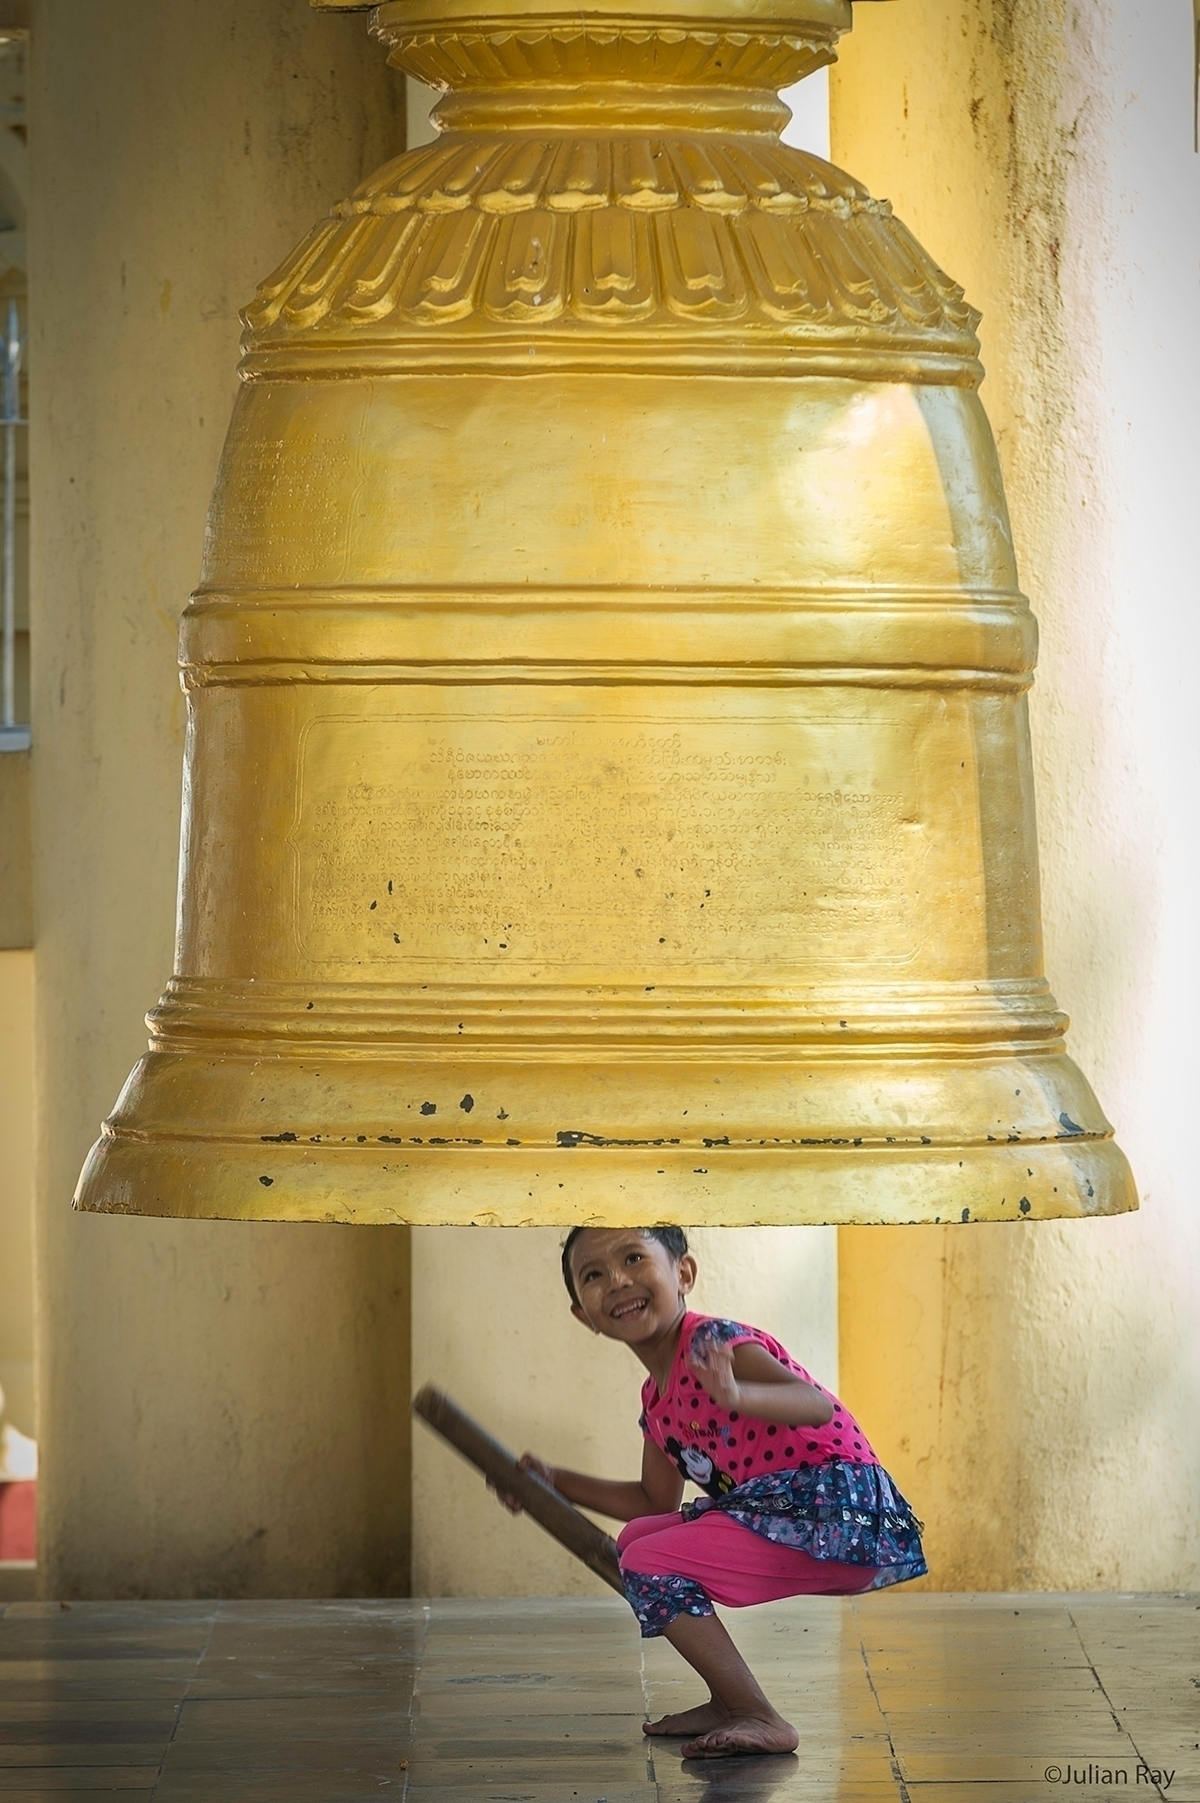 big sound small person - myanmar - julianrayphotography | ello